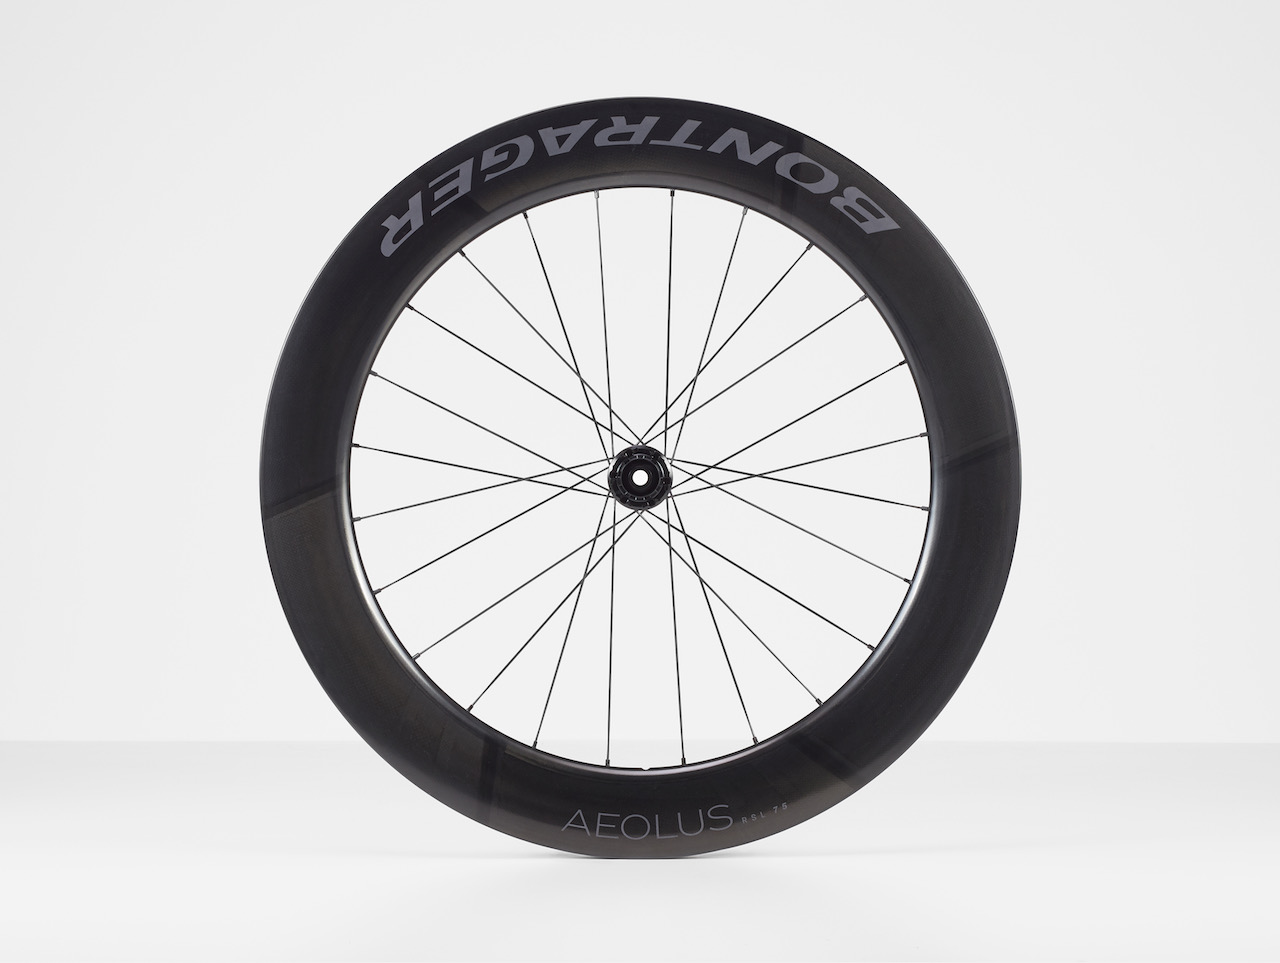 Bontrager Aeolus RSL road wheels side profile